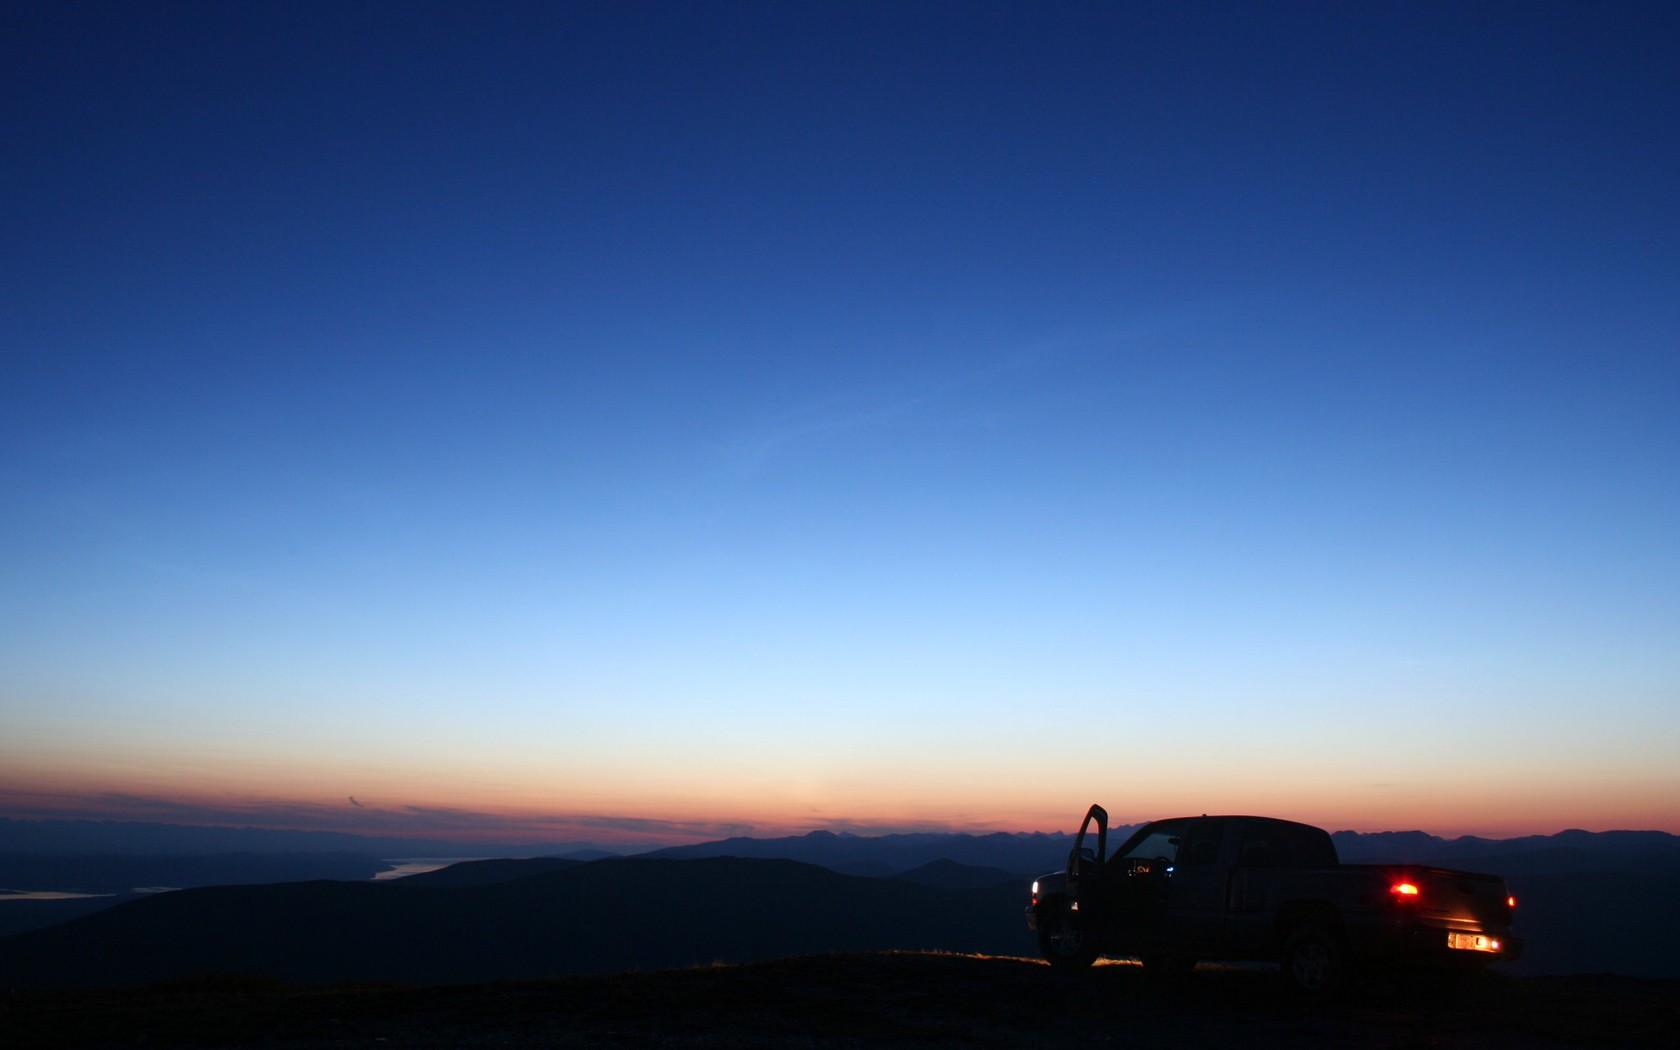 Sunlight Landscape Simple Background Sunset Night Hill Car Sky Vehicle Sunrise Blue Evening Morning Sun